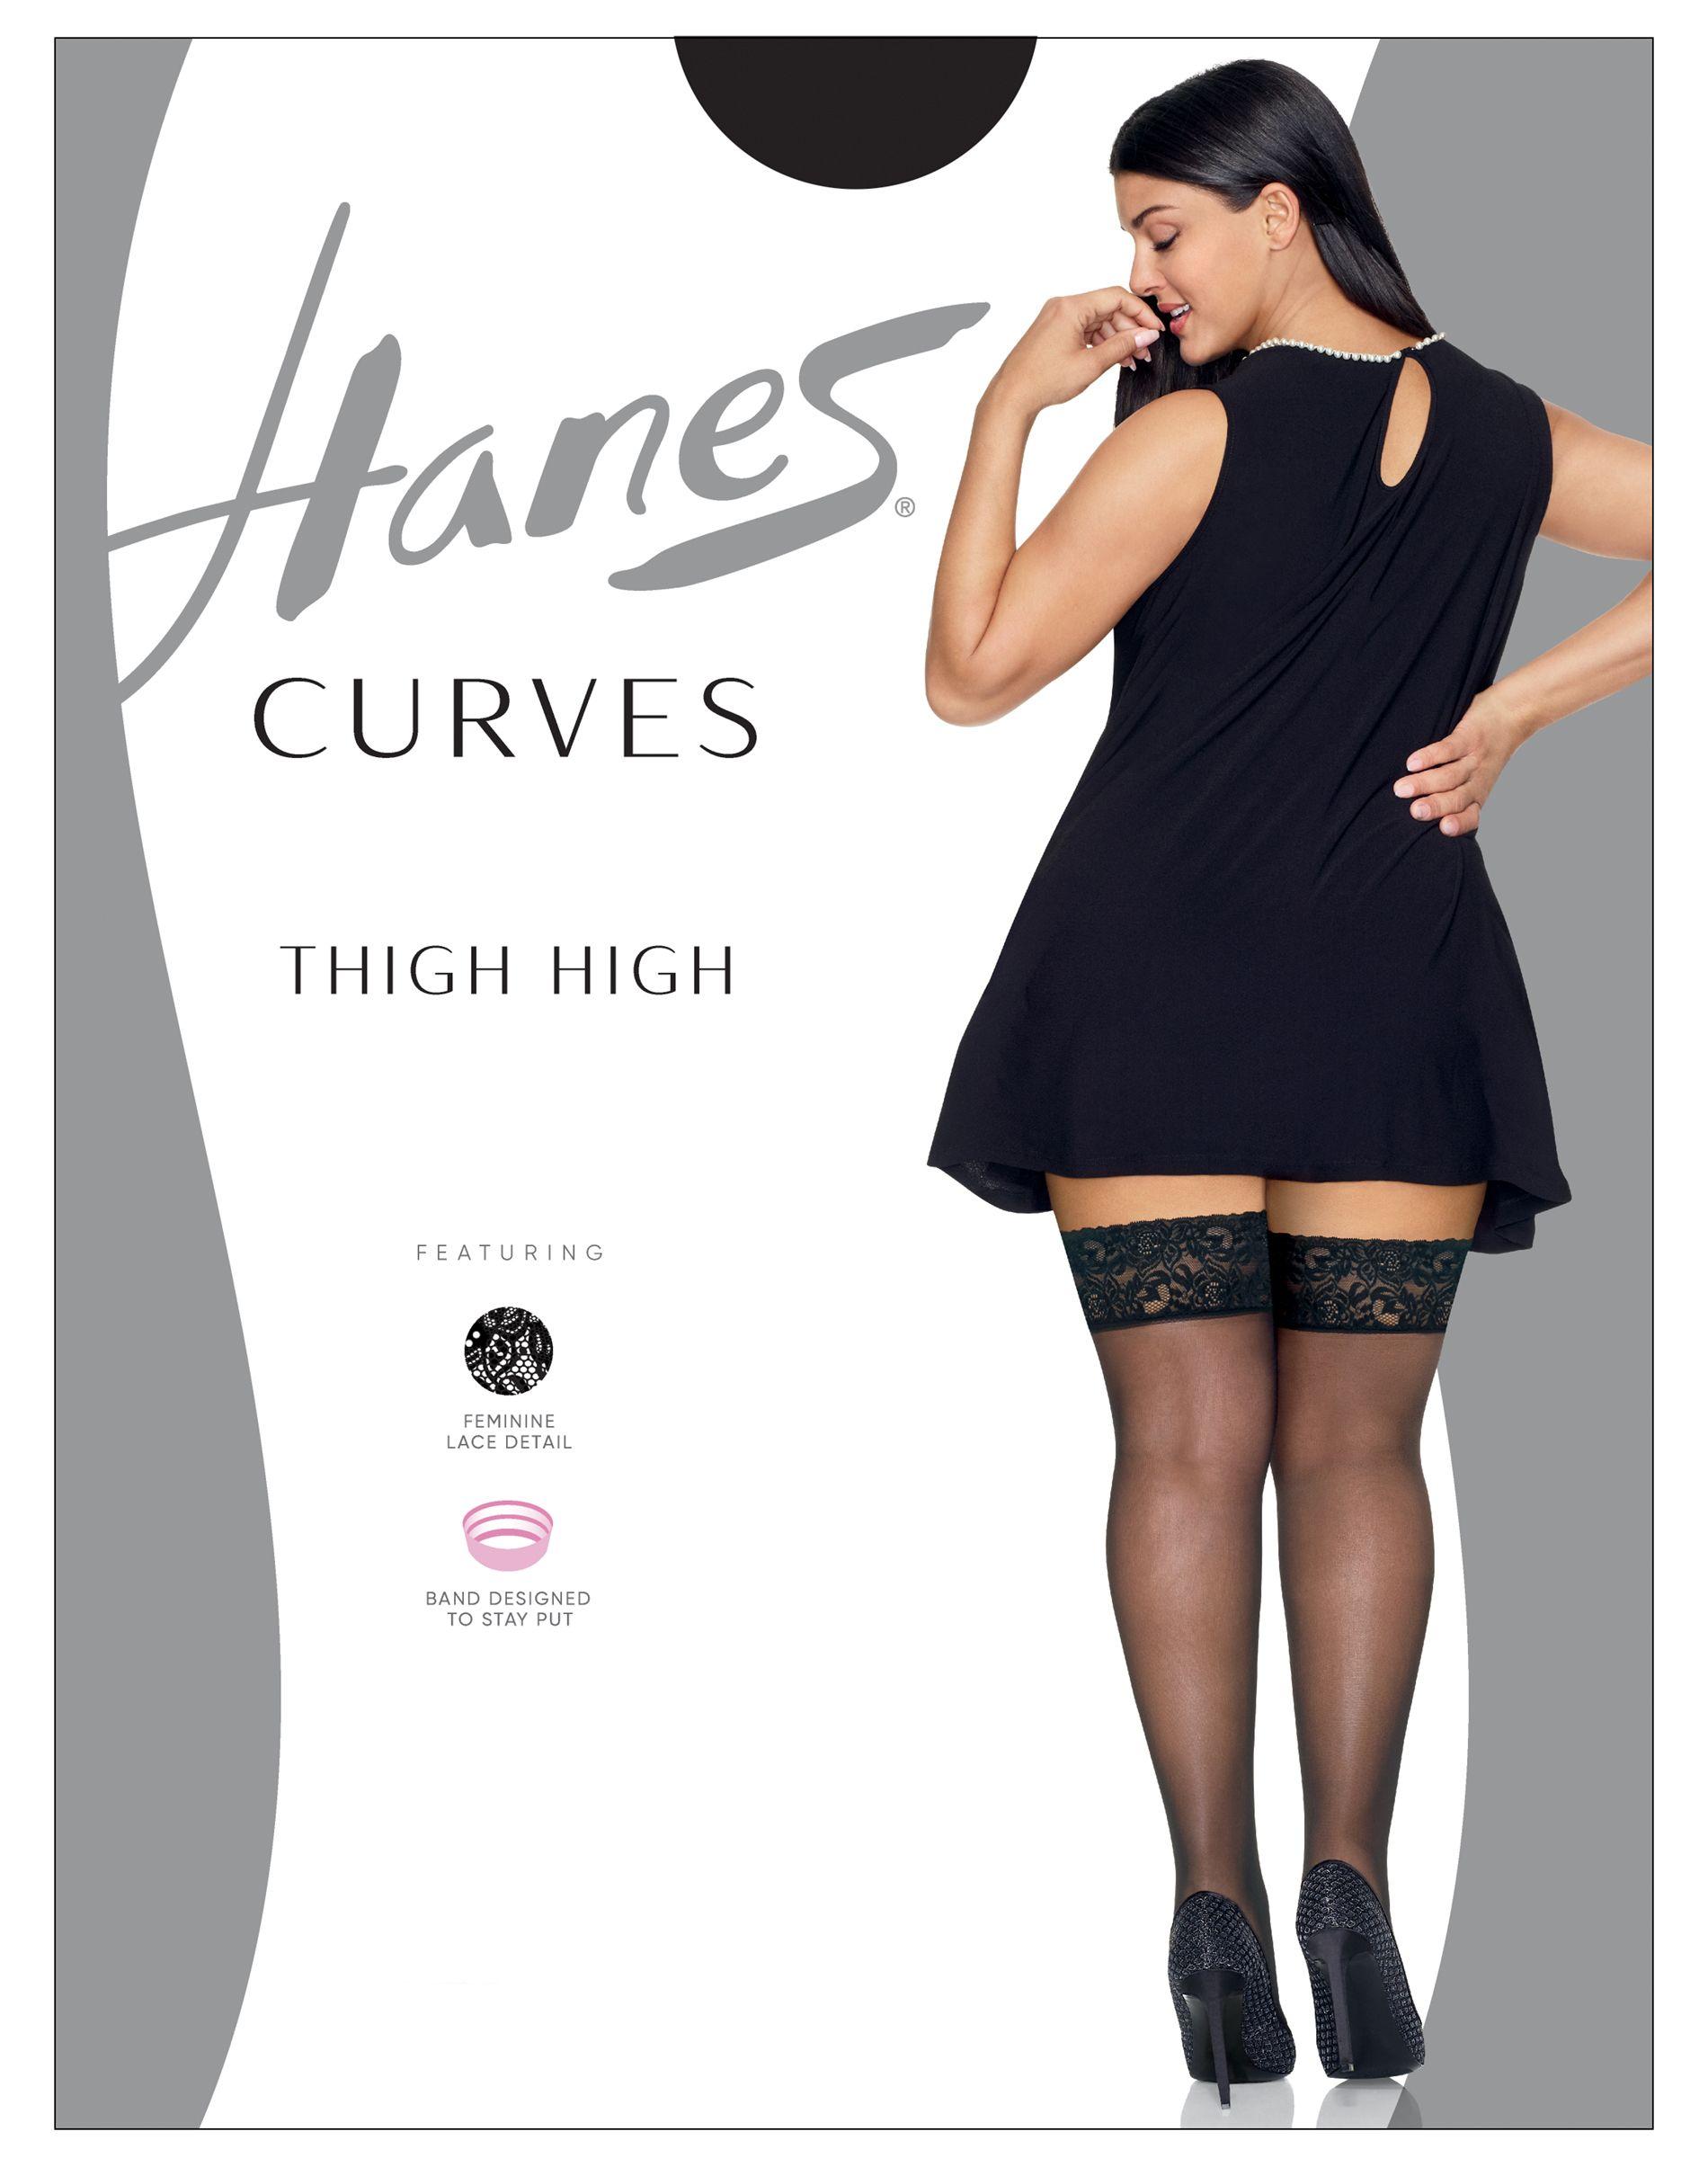 Hanes Curves Lace Thigh High women Hanes